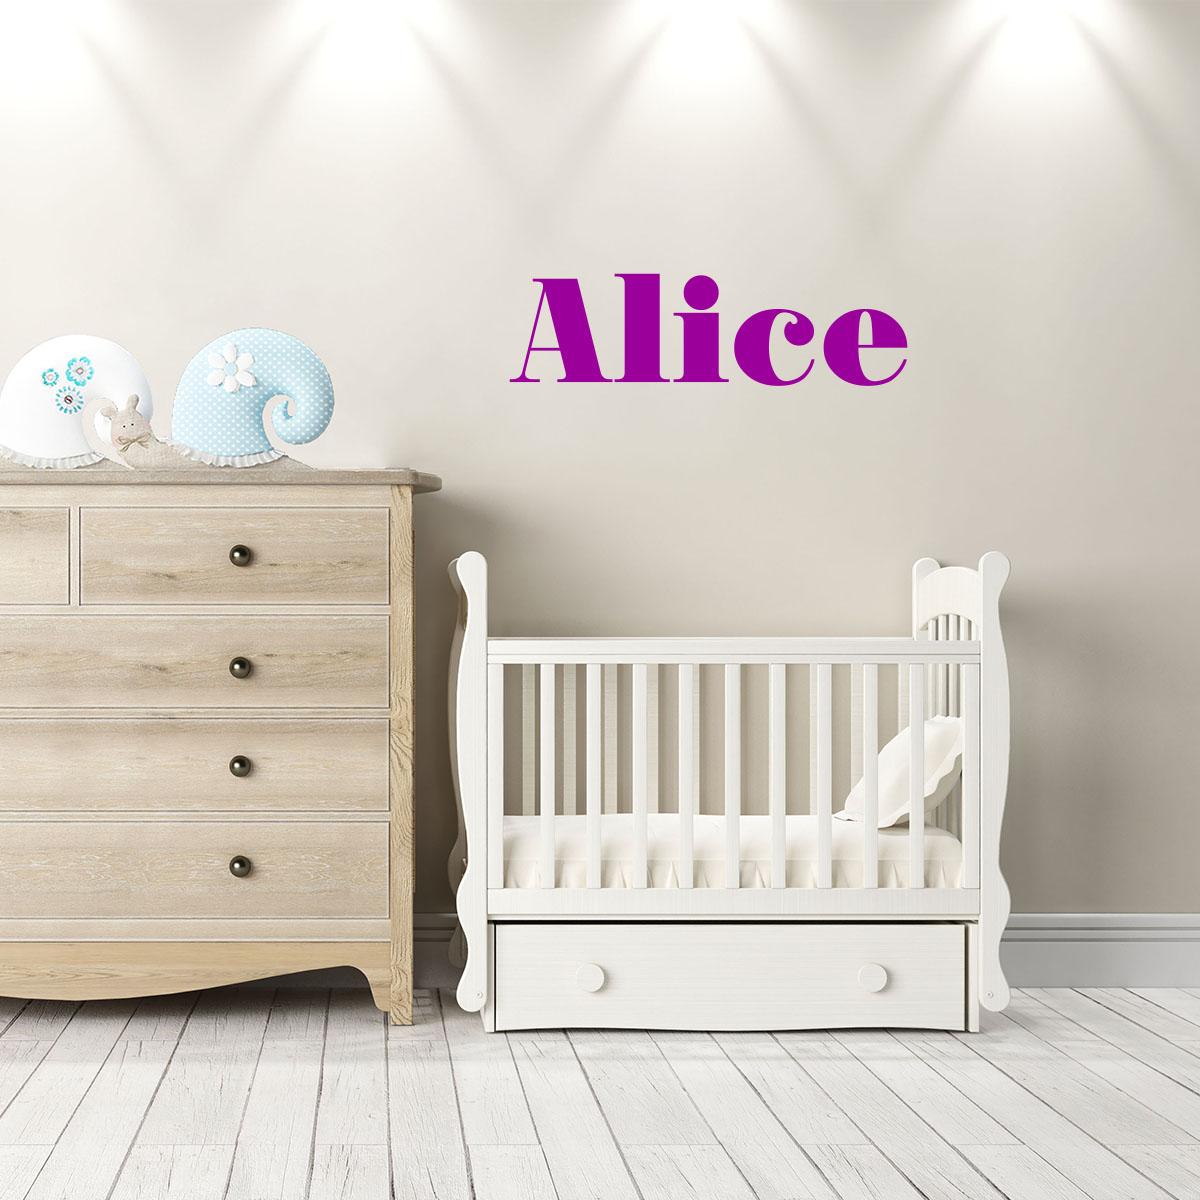 sticker pr nom personnalisable classique attachant. Black Bedroom Furniture Sets. Home Design Ideas